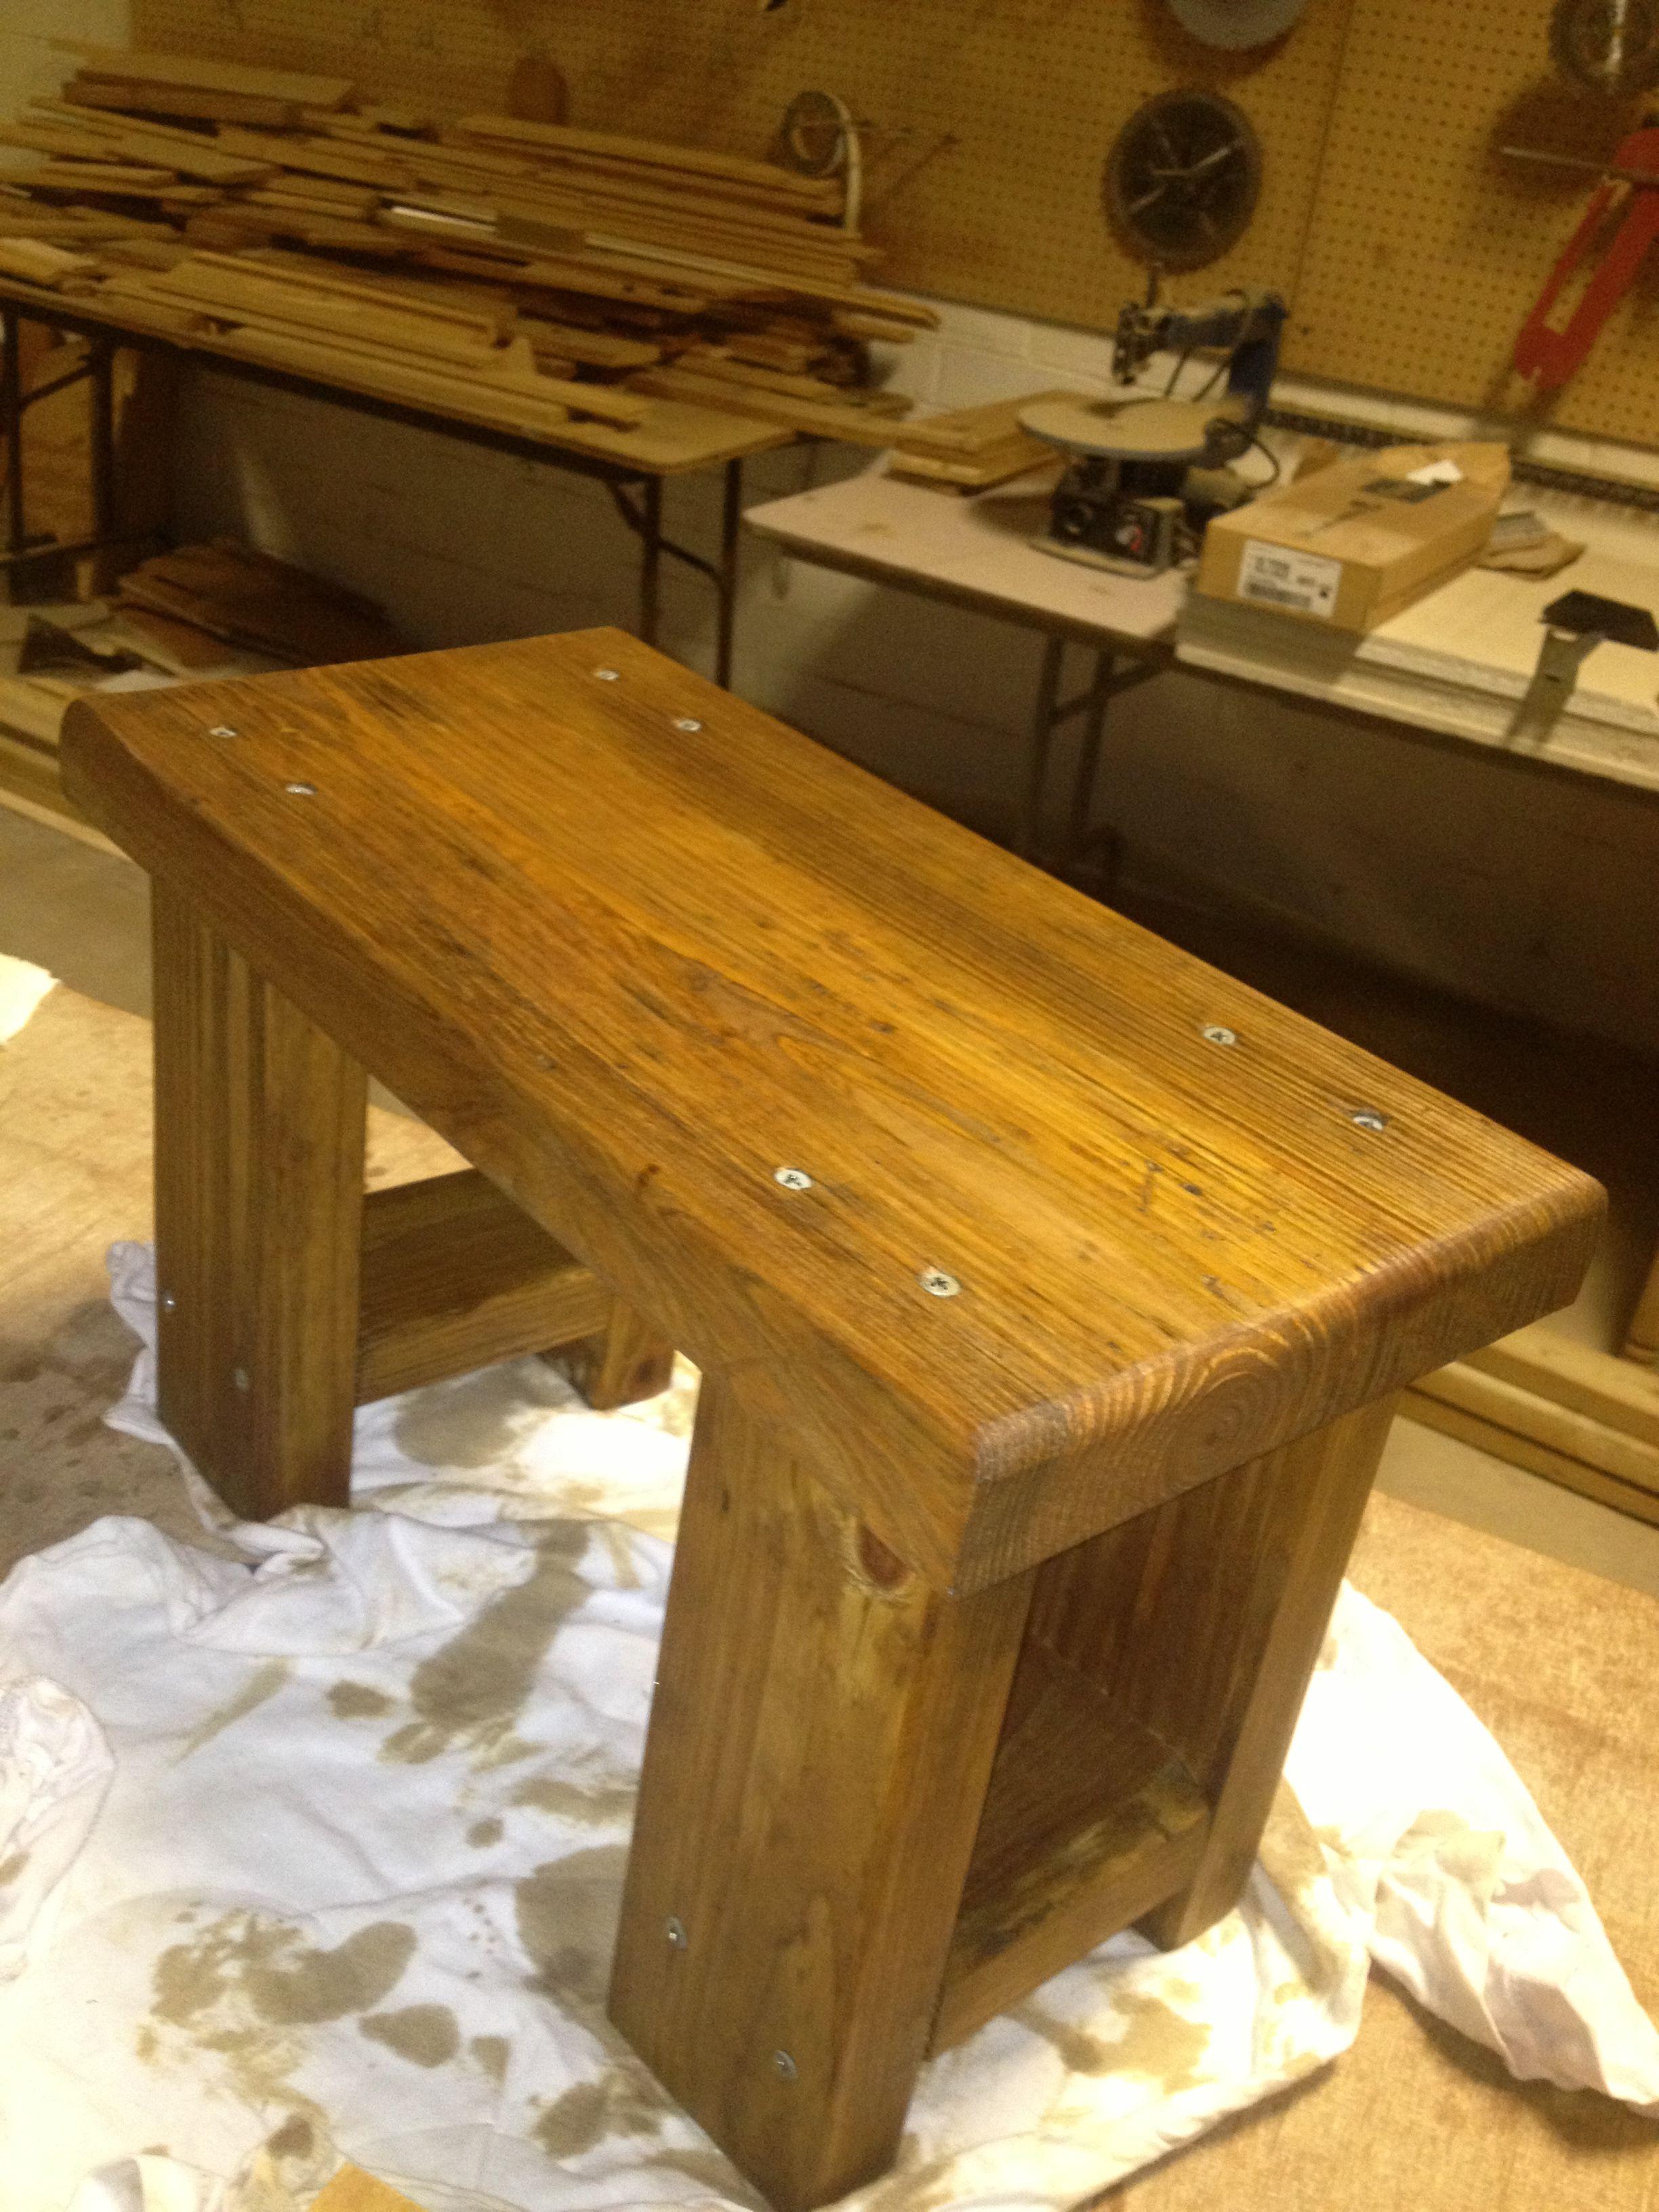 Marvelous Reclaimed Wood Made Into Heavy Duty Foot Stool Rustic Wood Creativecarmelina Interior Chair Design Creativecarmelinacom